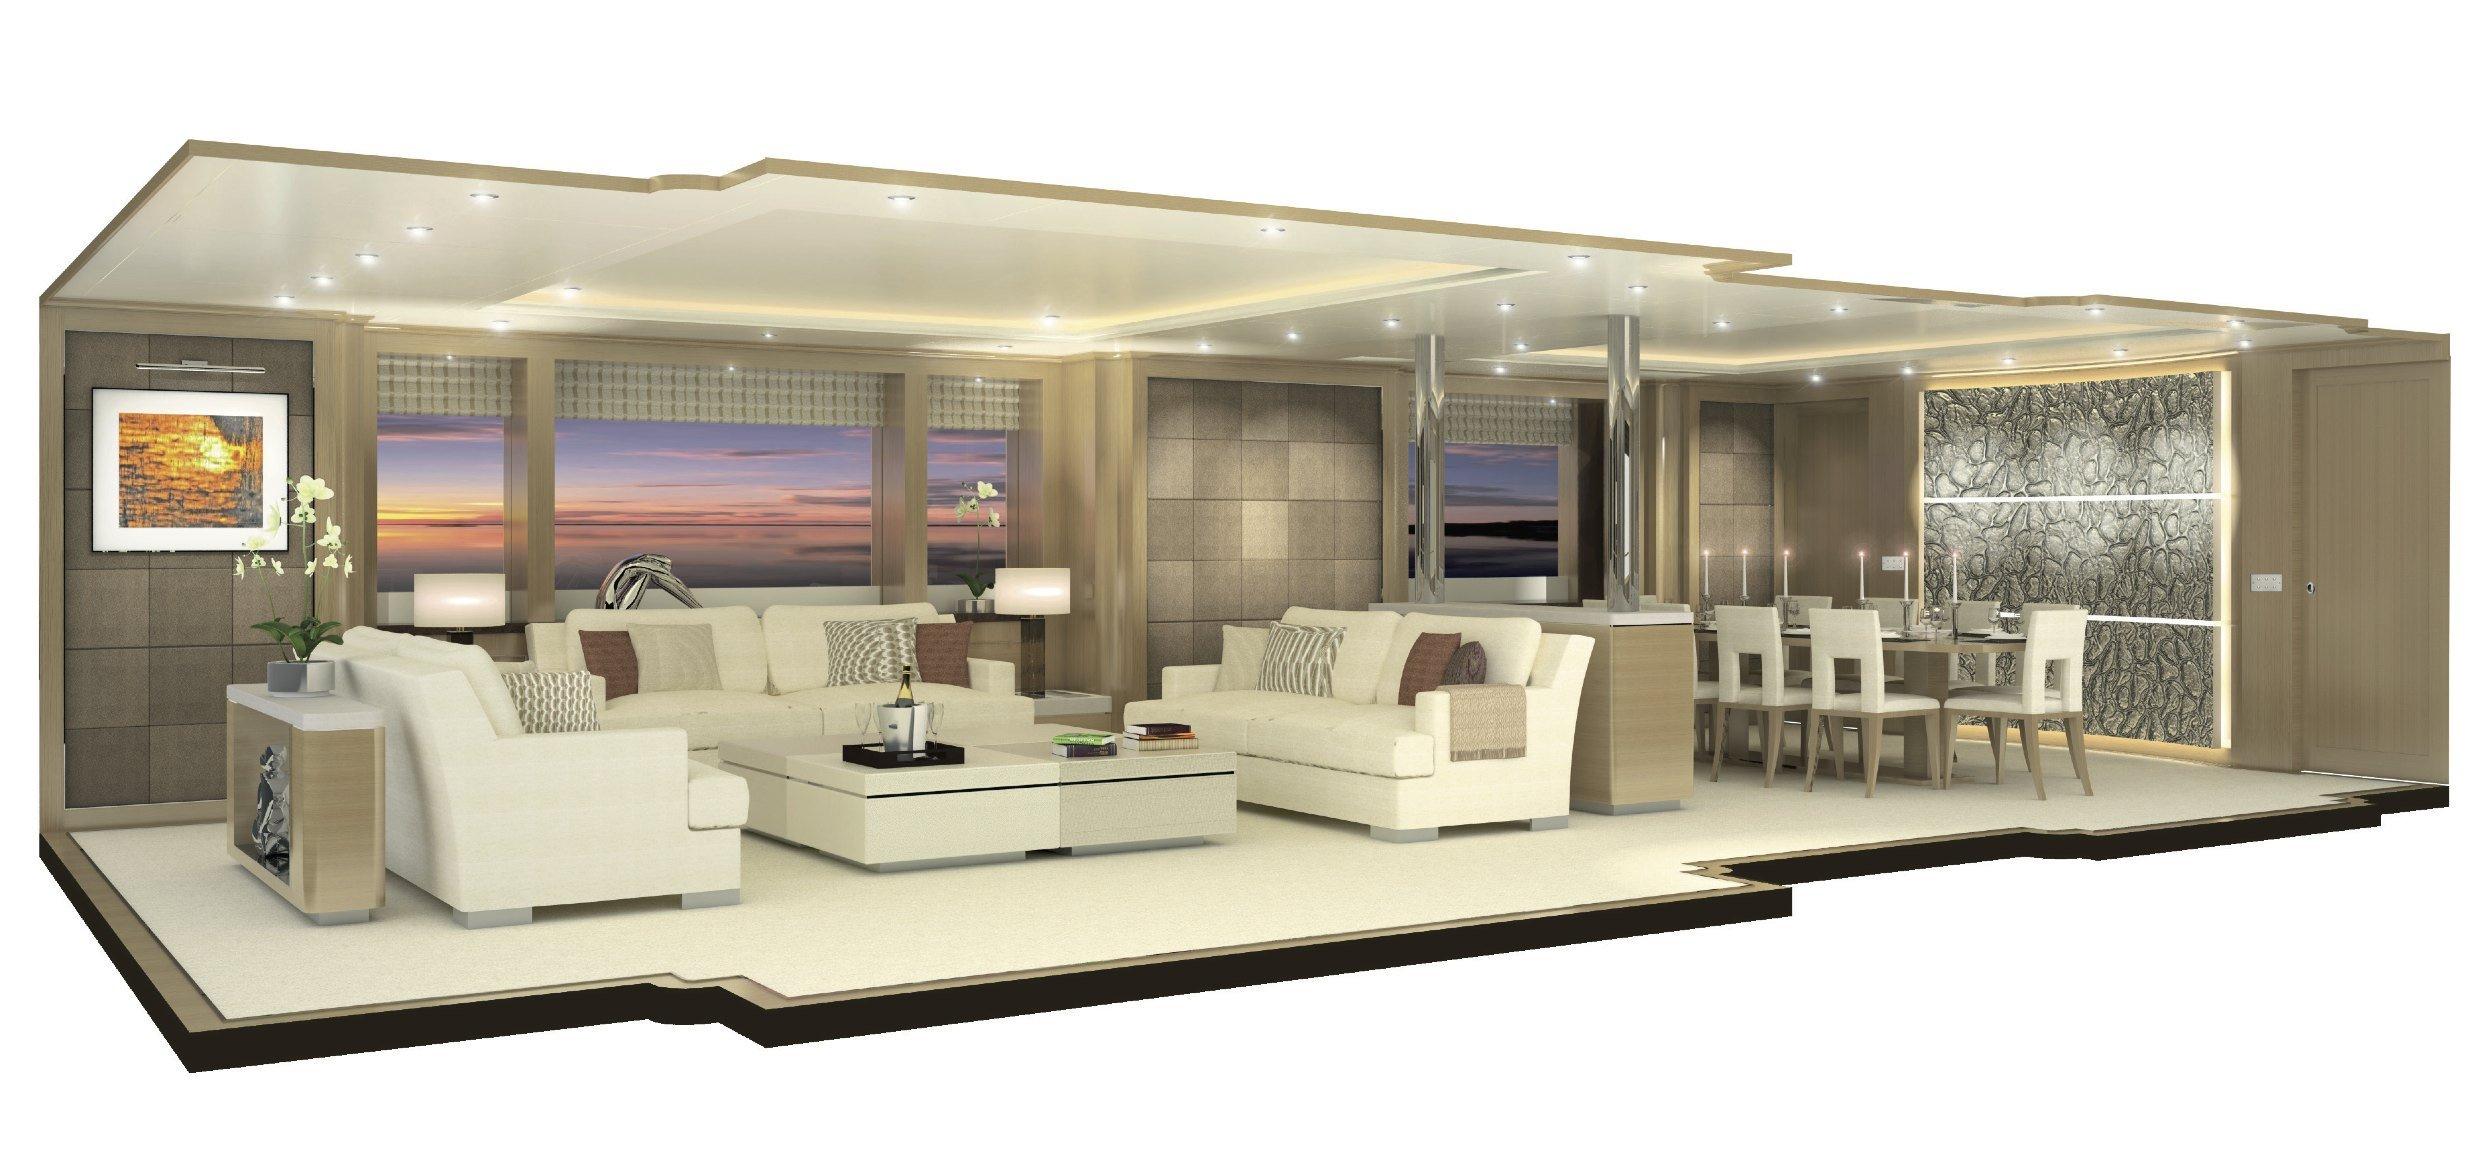 Superyachten interieur  Jean-Claude Carme Discusses New Projects at..   superyachts.com